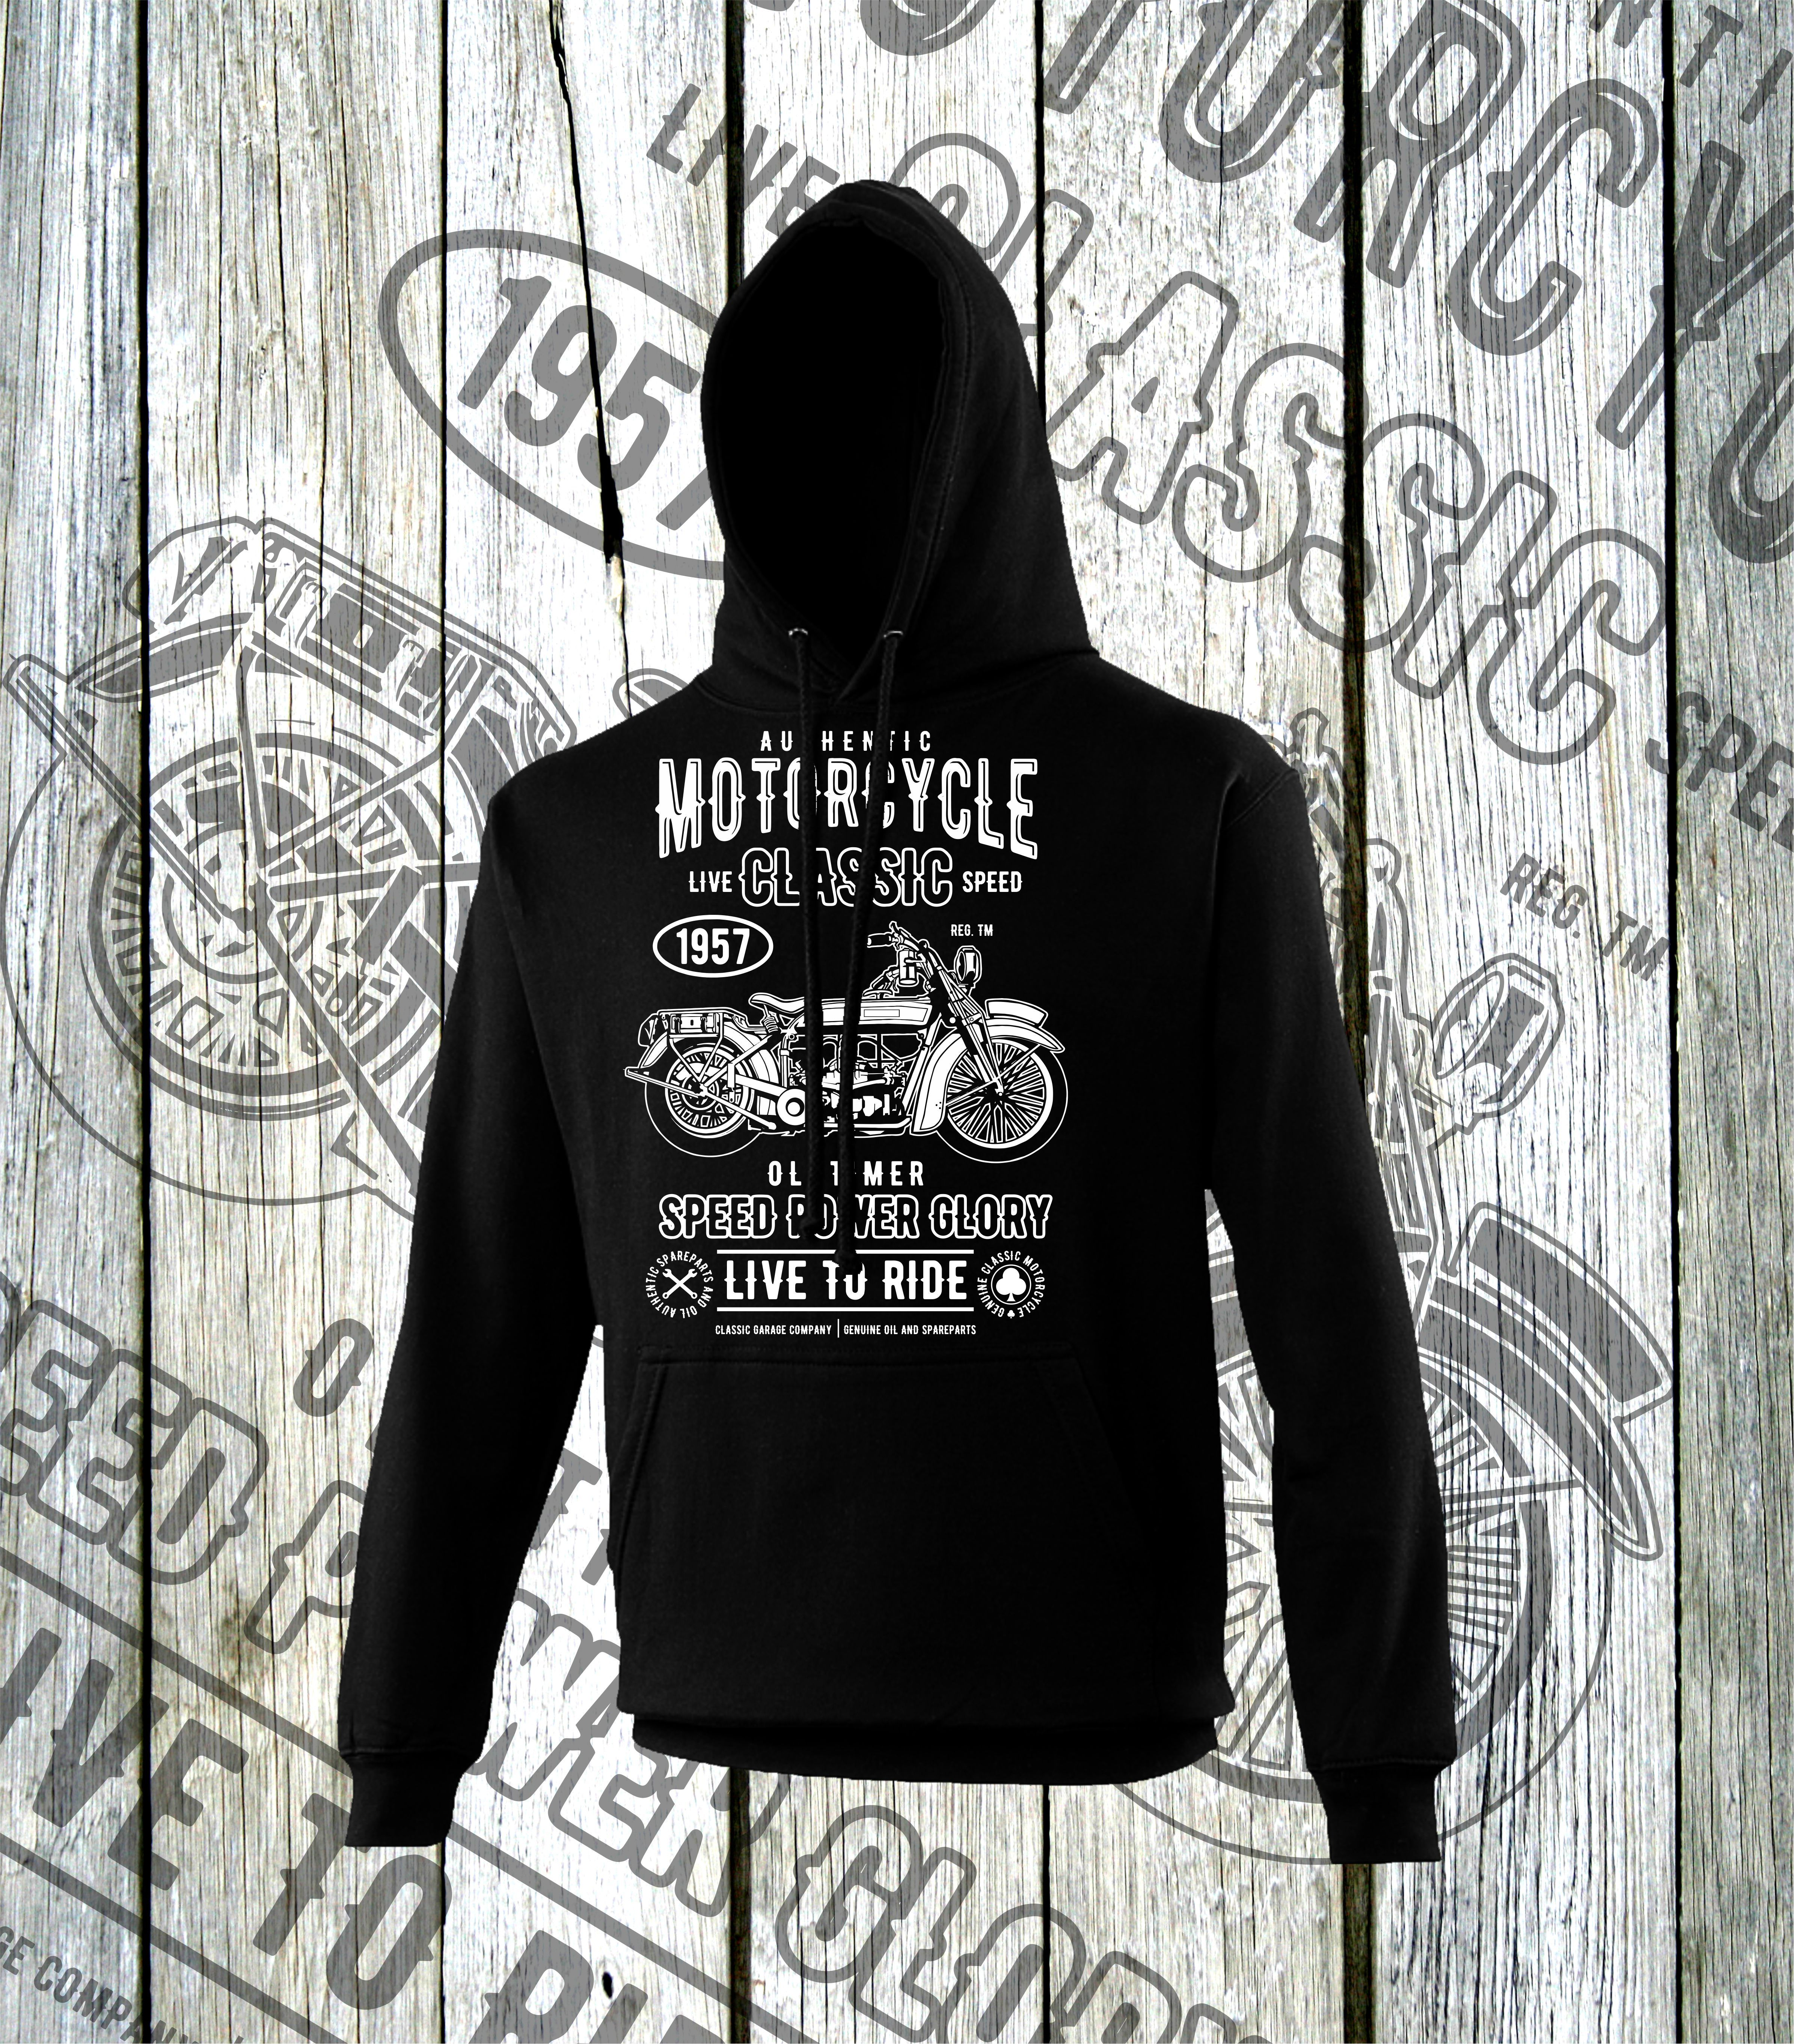 Bike Racing Unisex /& Kids T-shirt No Speed Limits Motorcycle Club Biker